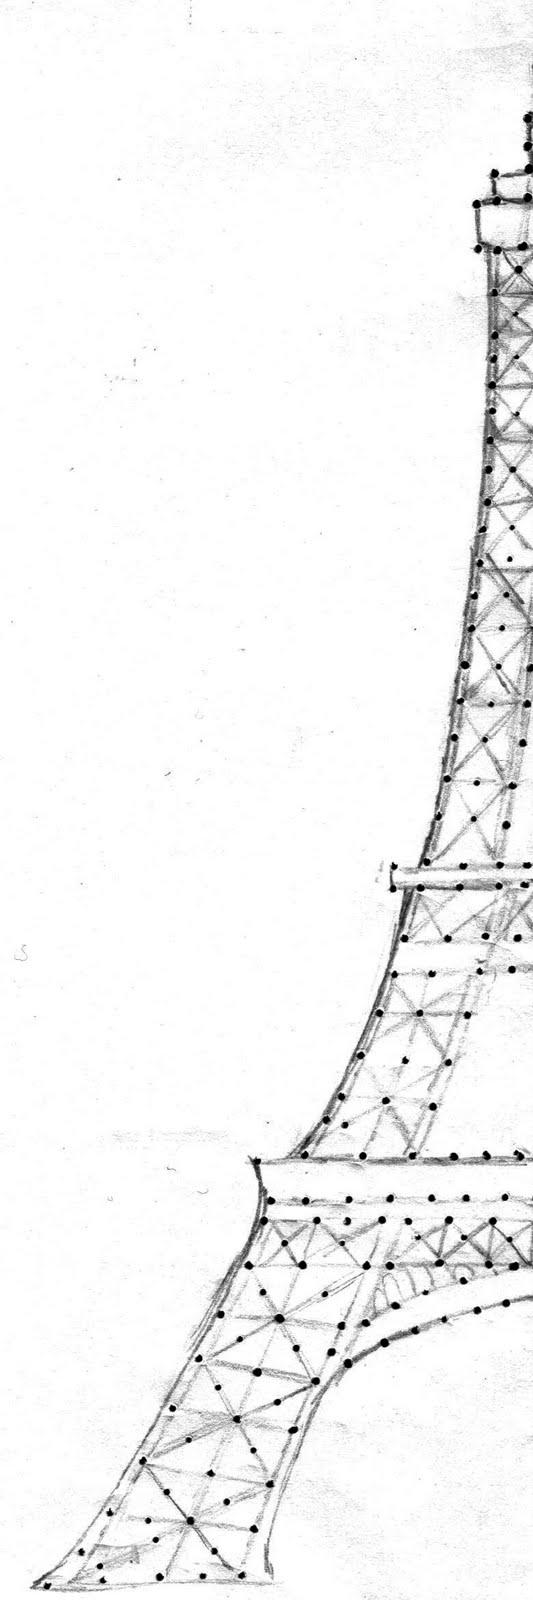 eiffel tower drawing patterns patterns kid